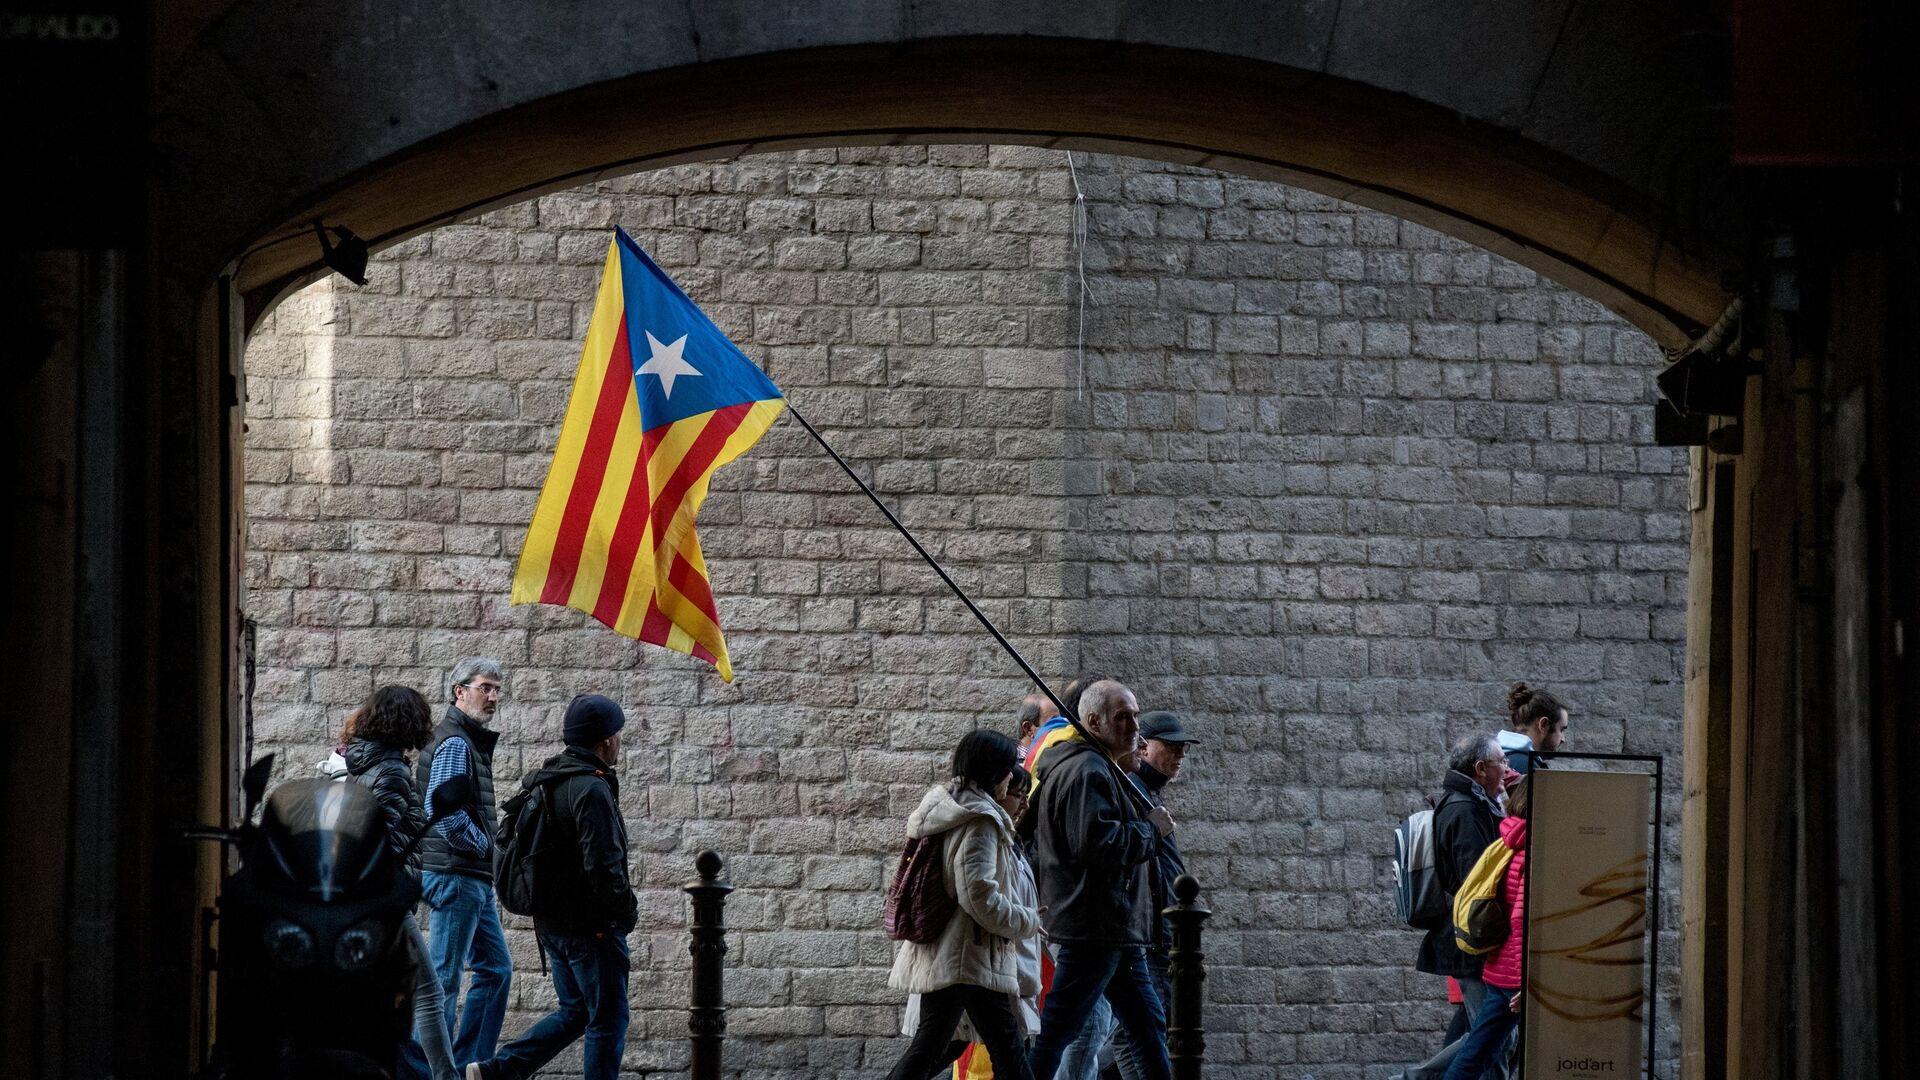 Manifestación independentista en Barcelona - Sputnik Mundo, 1920, 16.03.2021